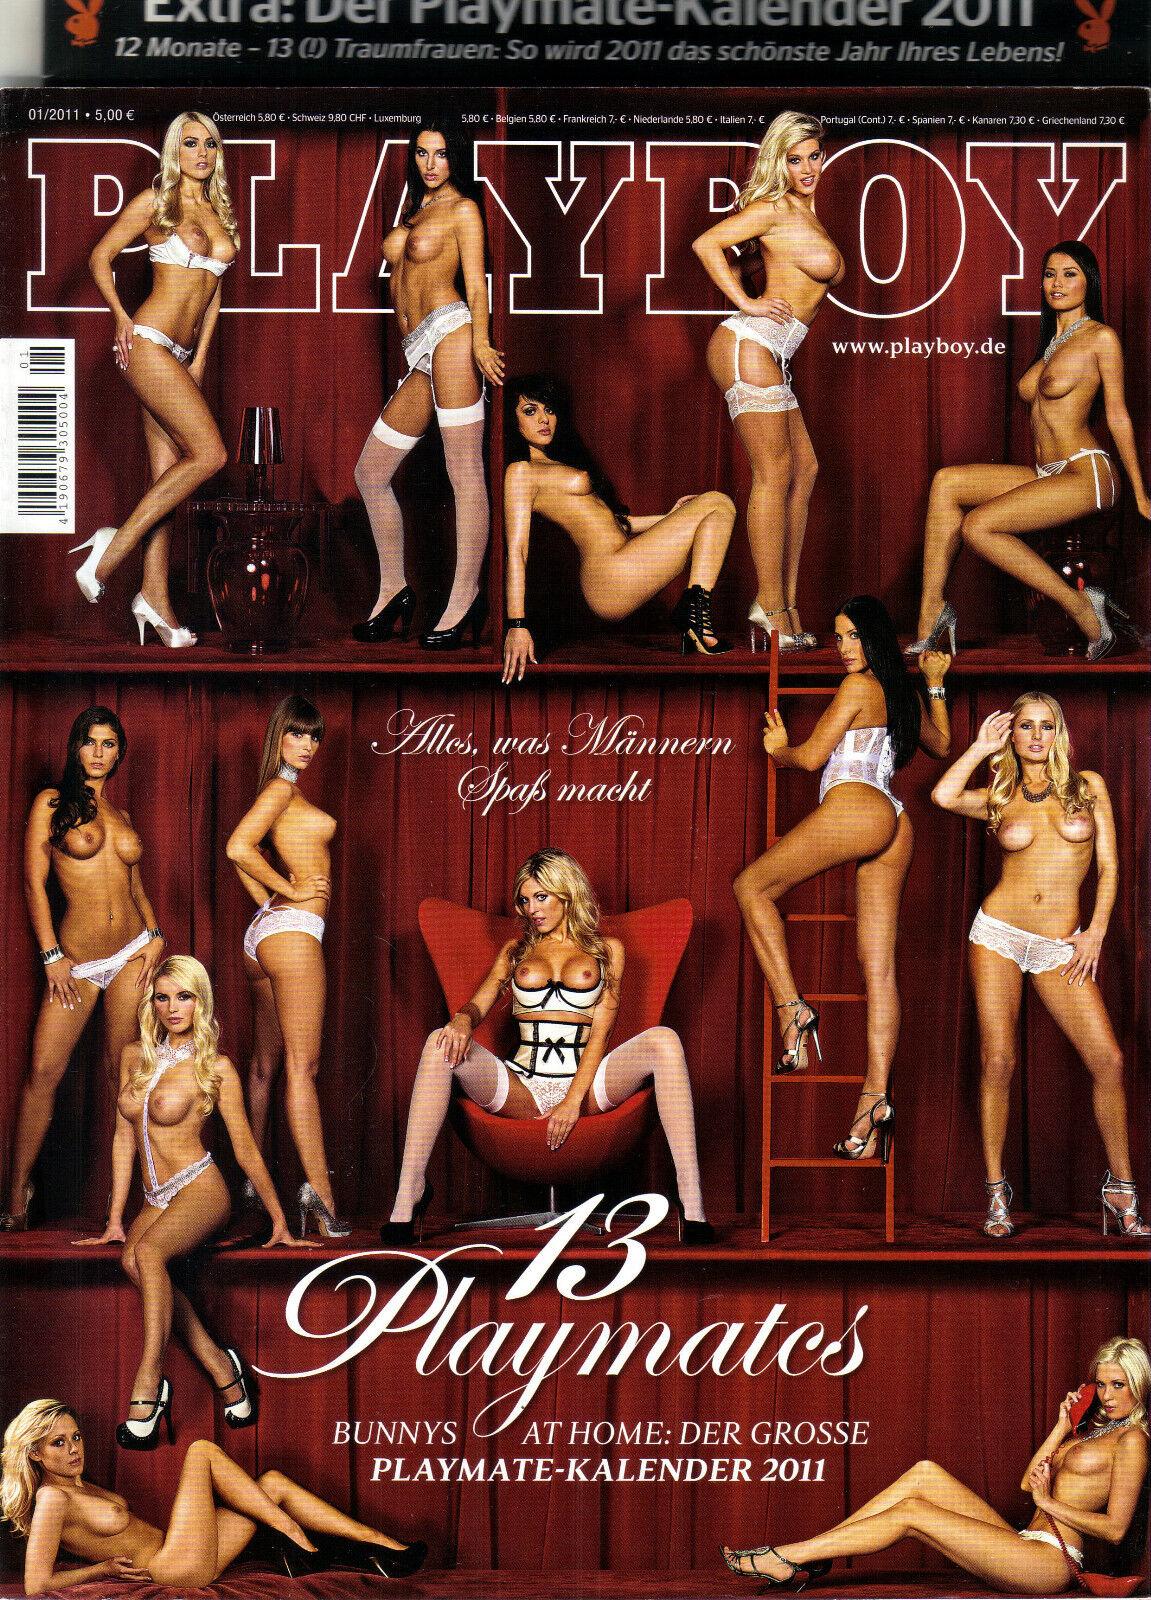 2011 playmate 10 Playmates